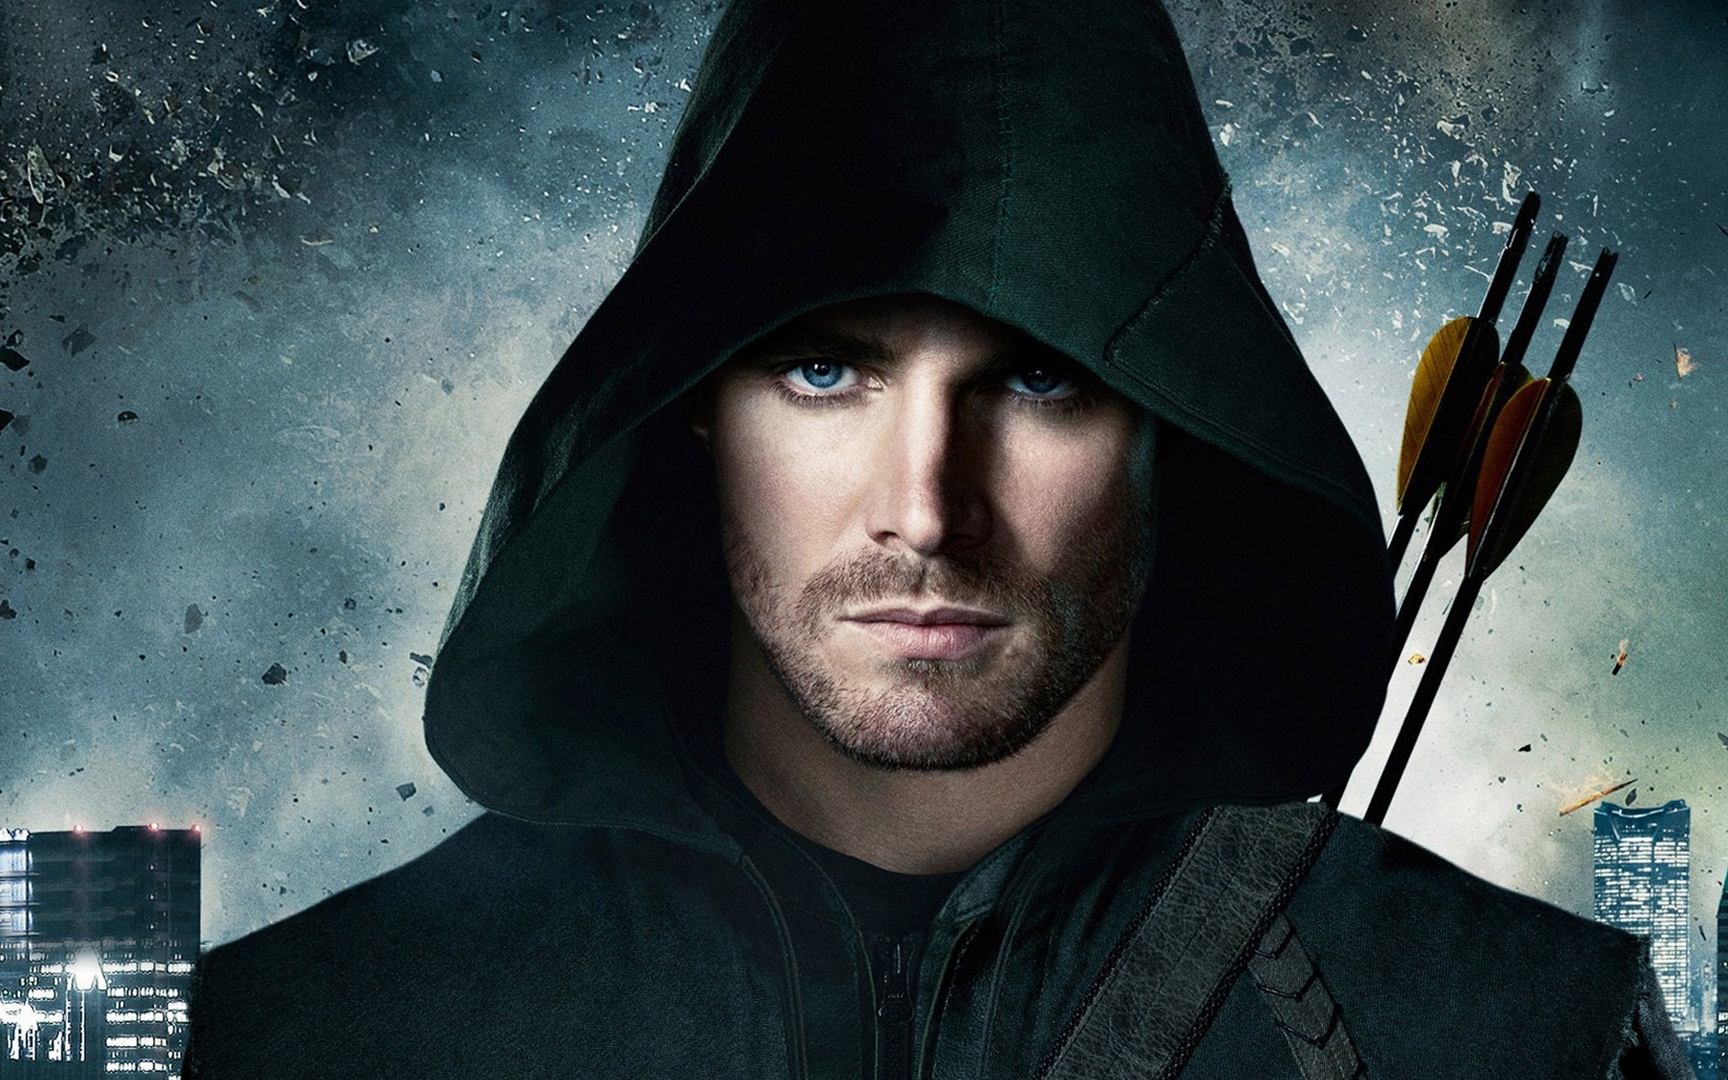 Oliver-Queen-from-Arrow-Tv-Series-Wallpaper-02